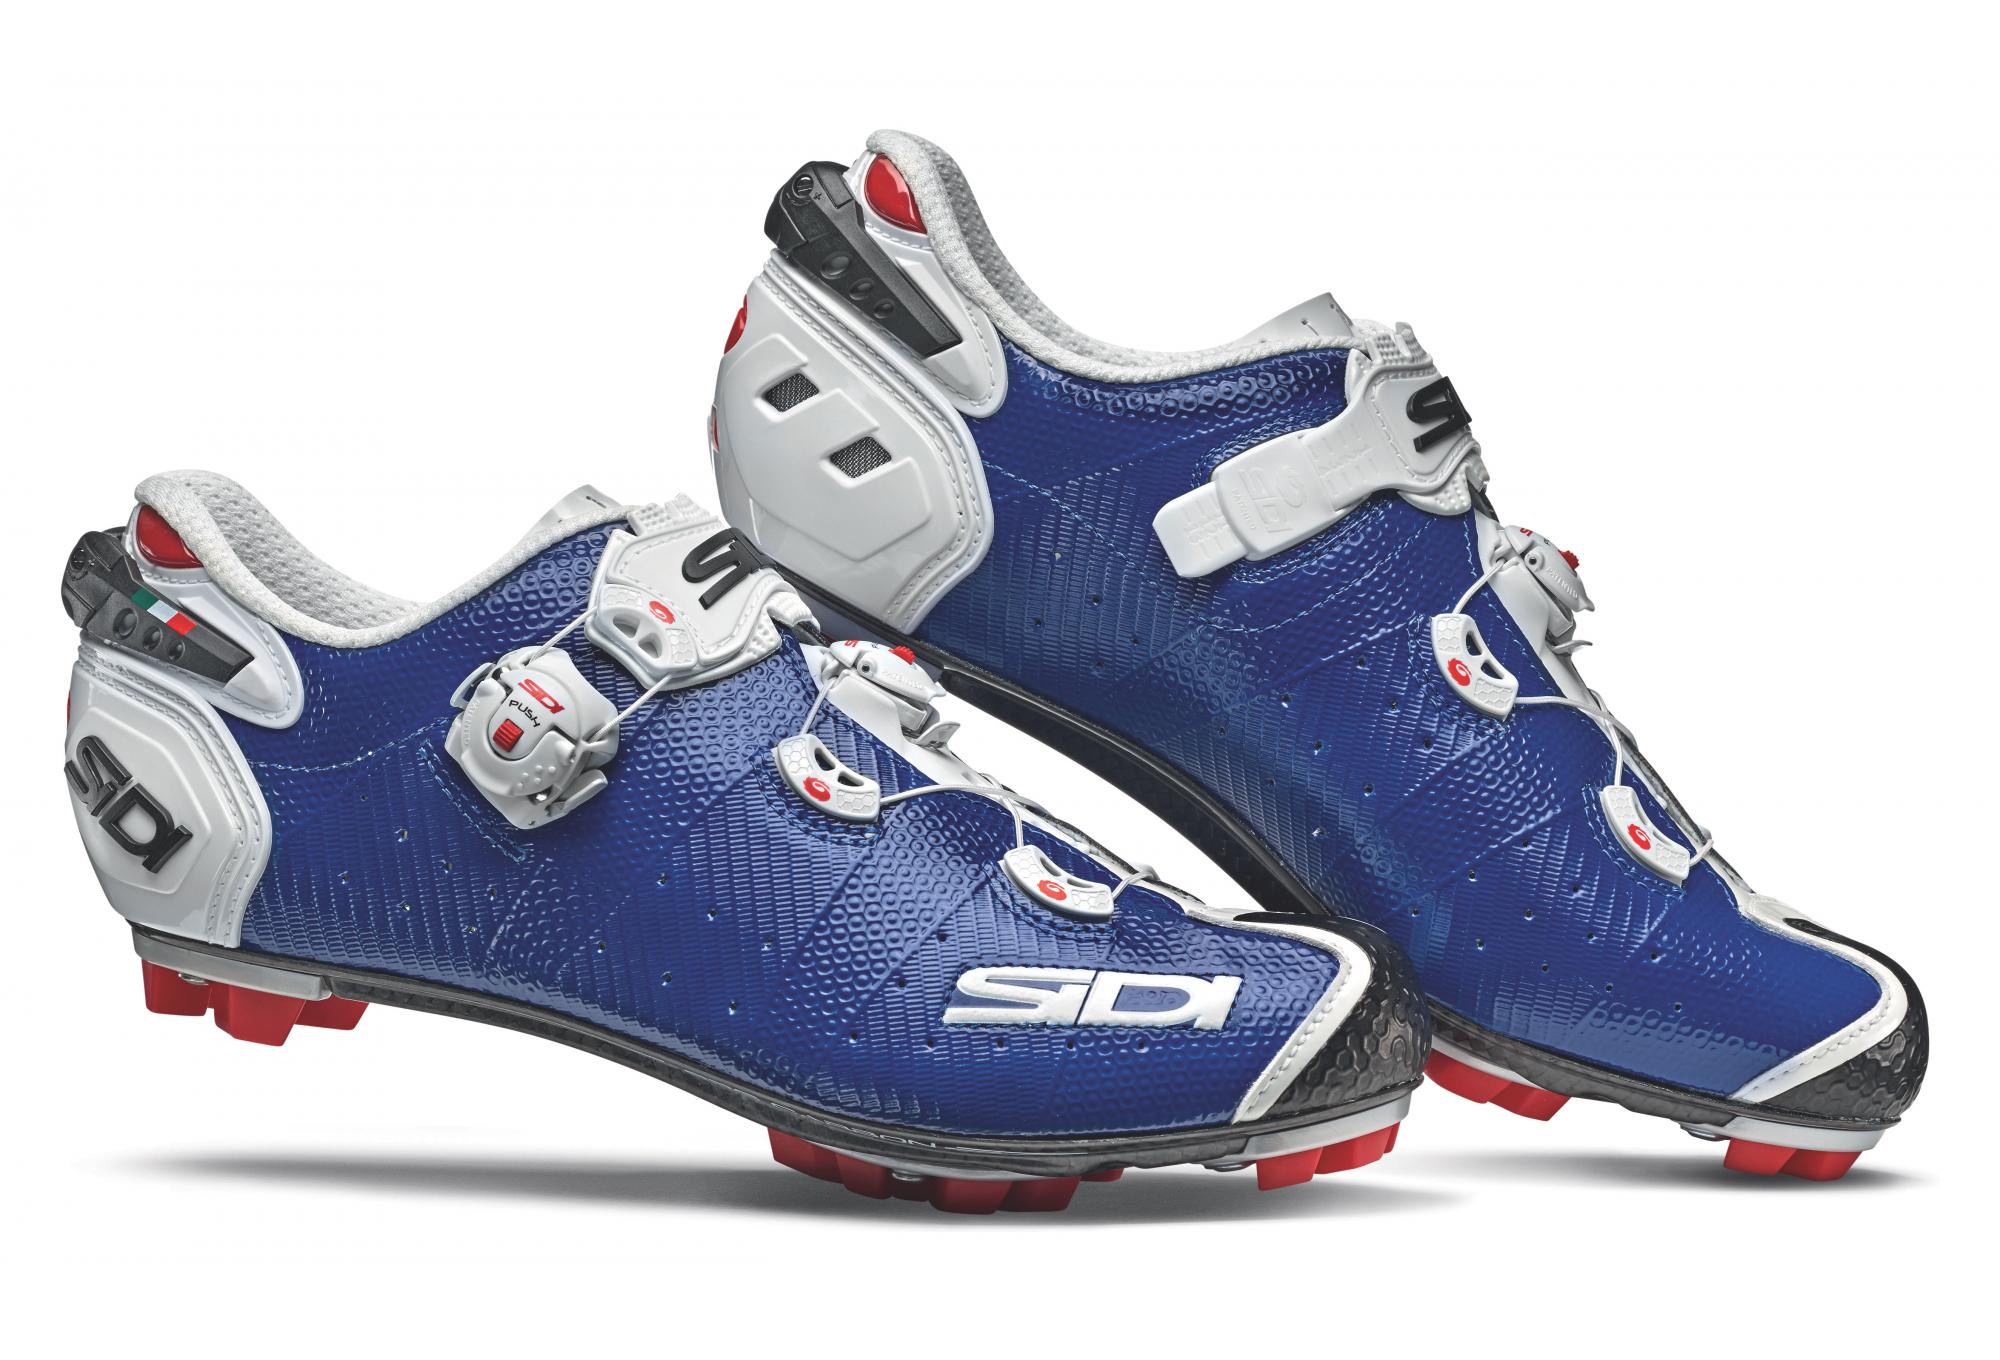 7658a46db72 Sidi Drako 2 SRS MTB Shoes Blue White | Alltricks.com